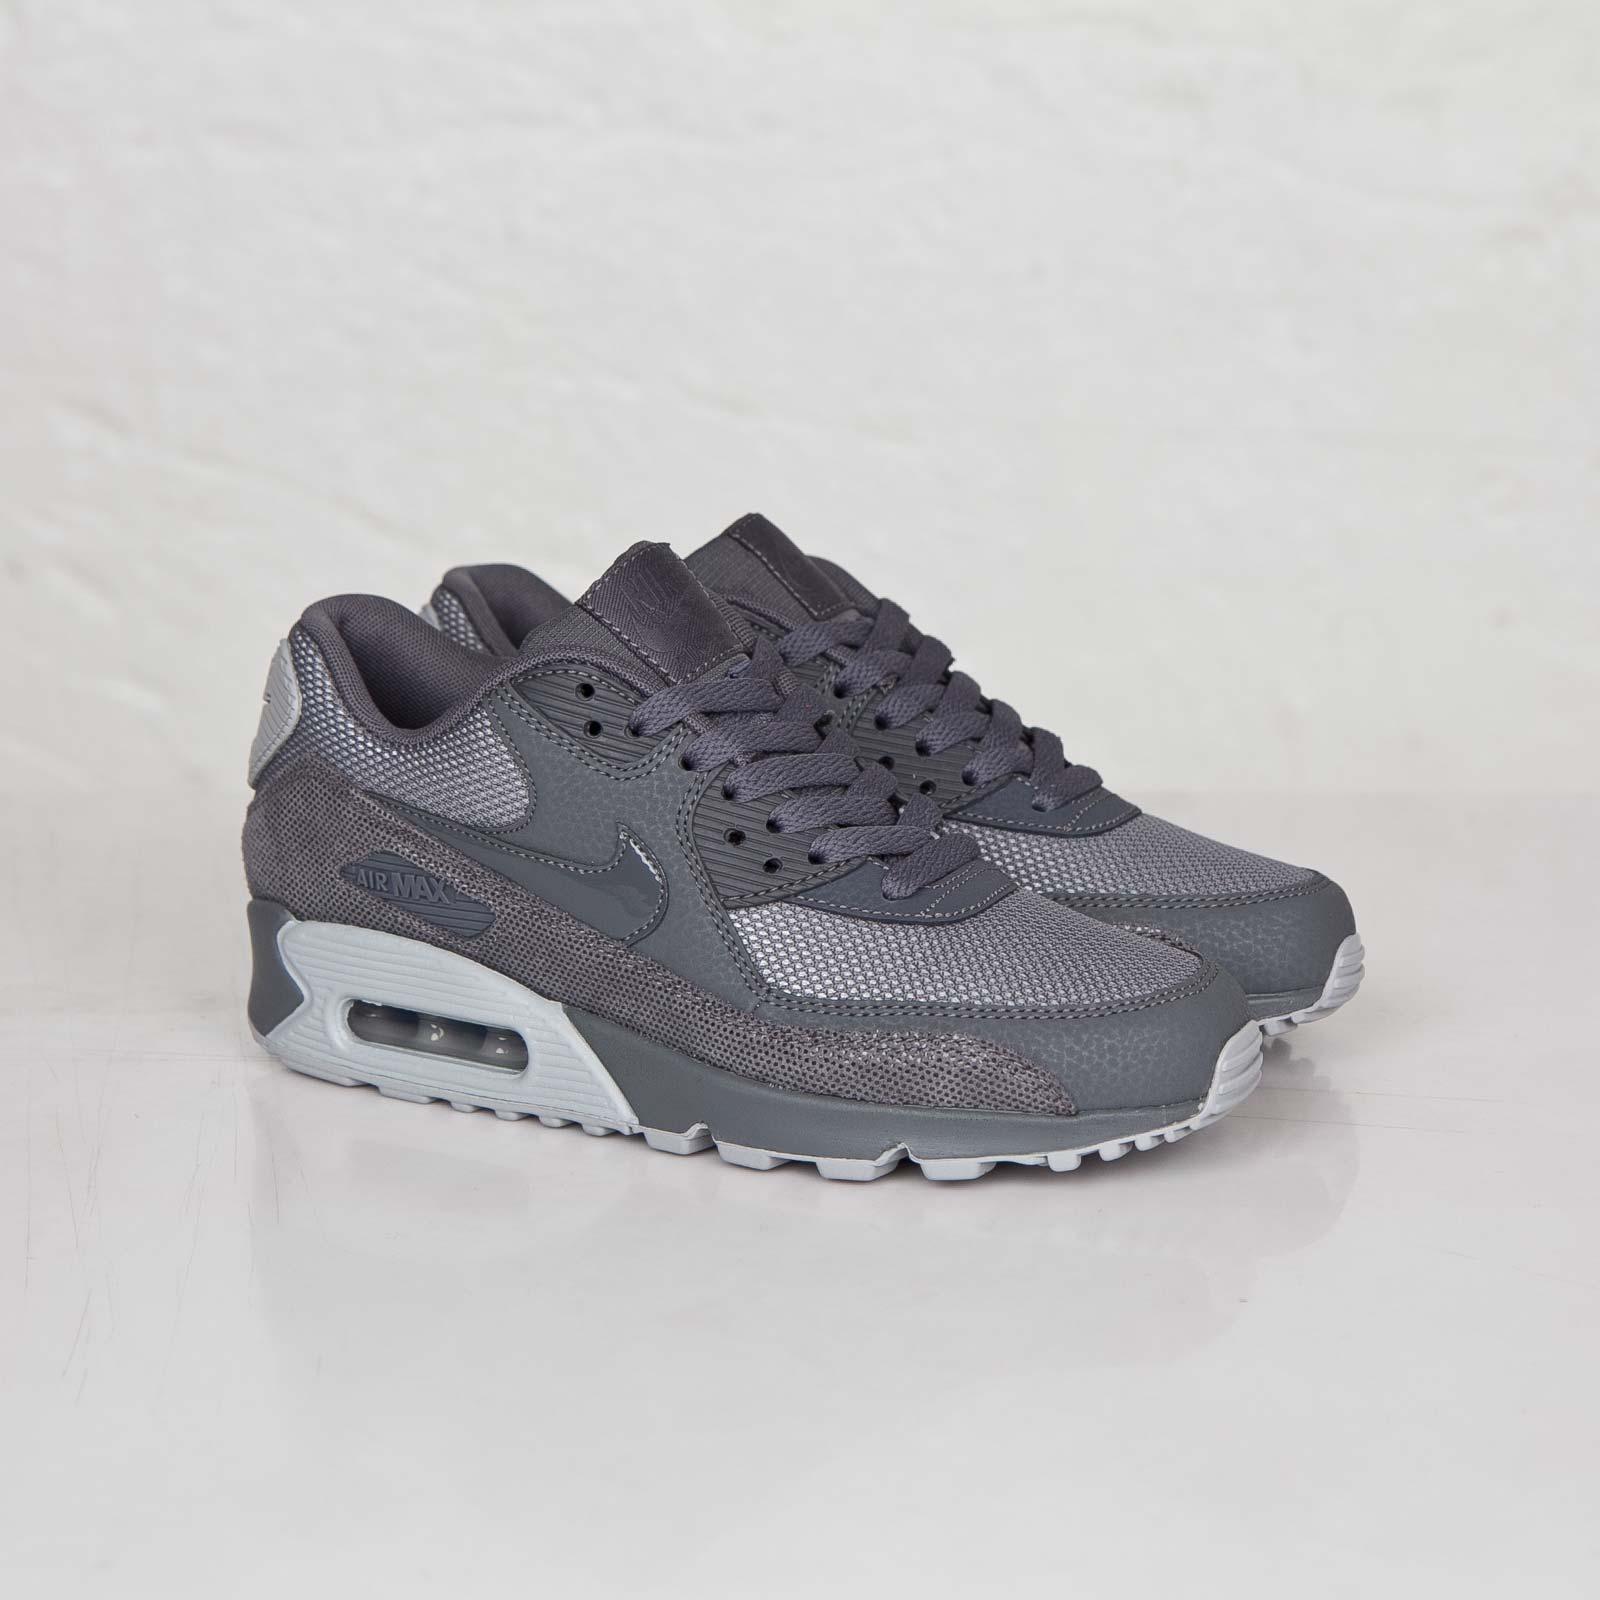 Nike Wmns Air Max 90 Premium 443817 004 Sneakersnstuff I